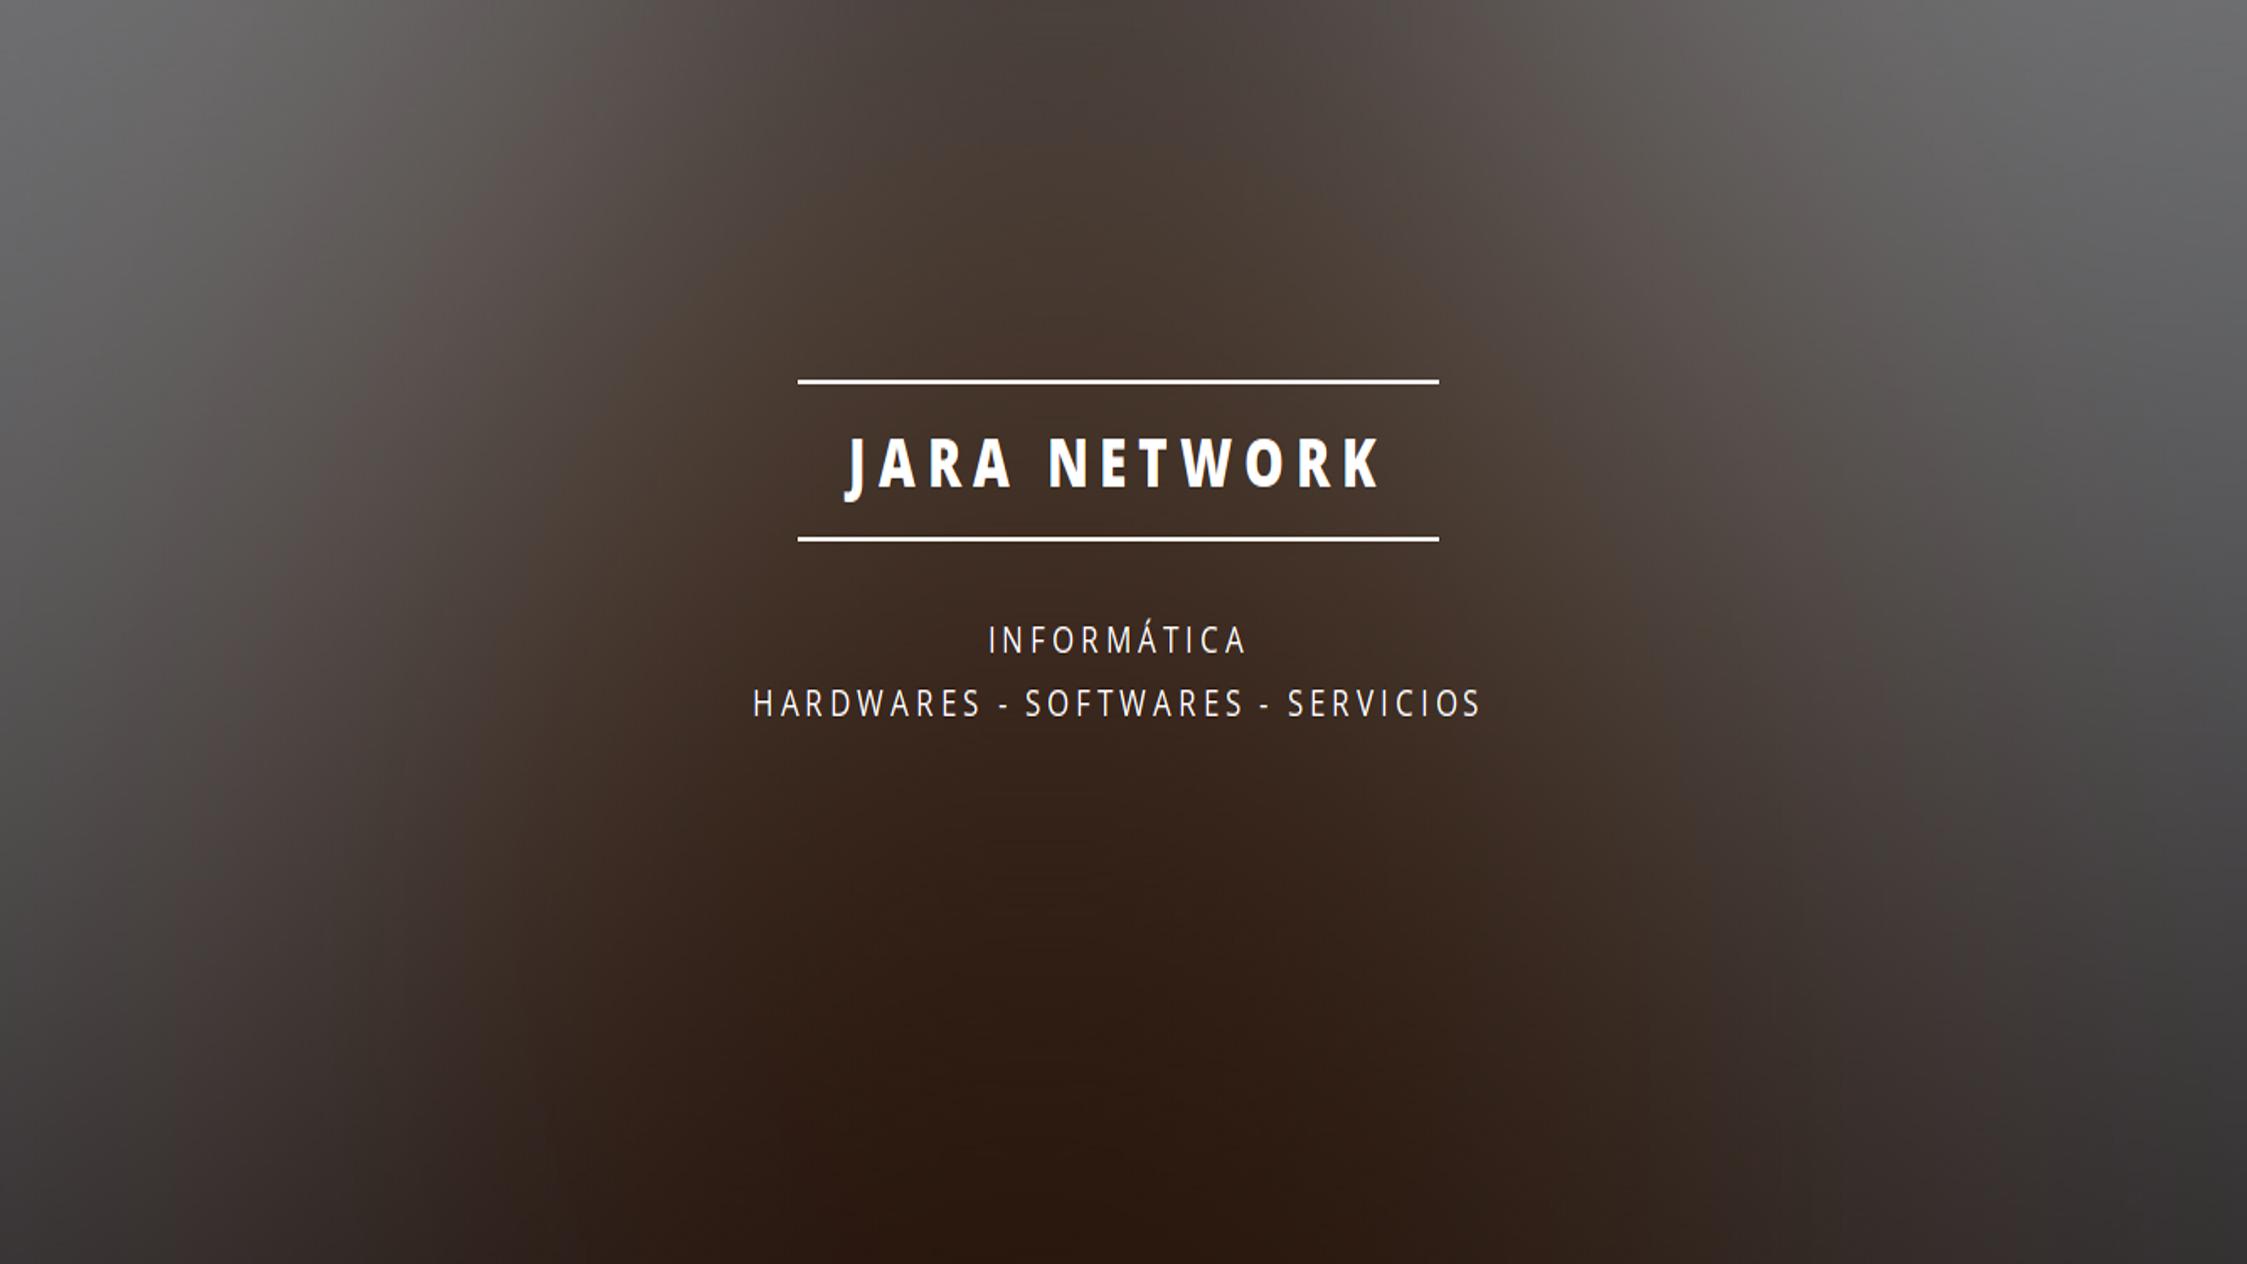 Jara Network